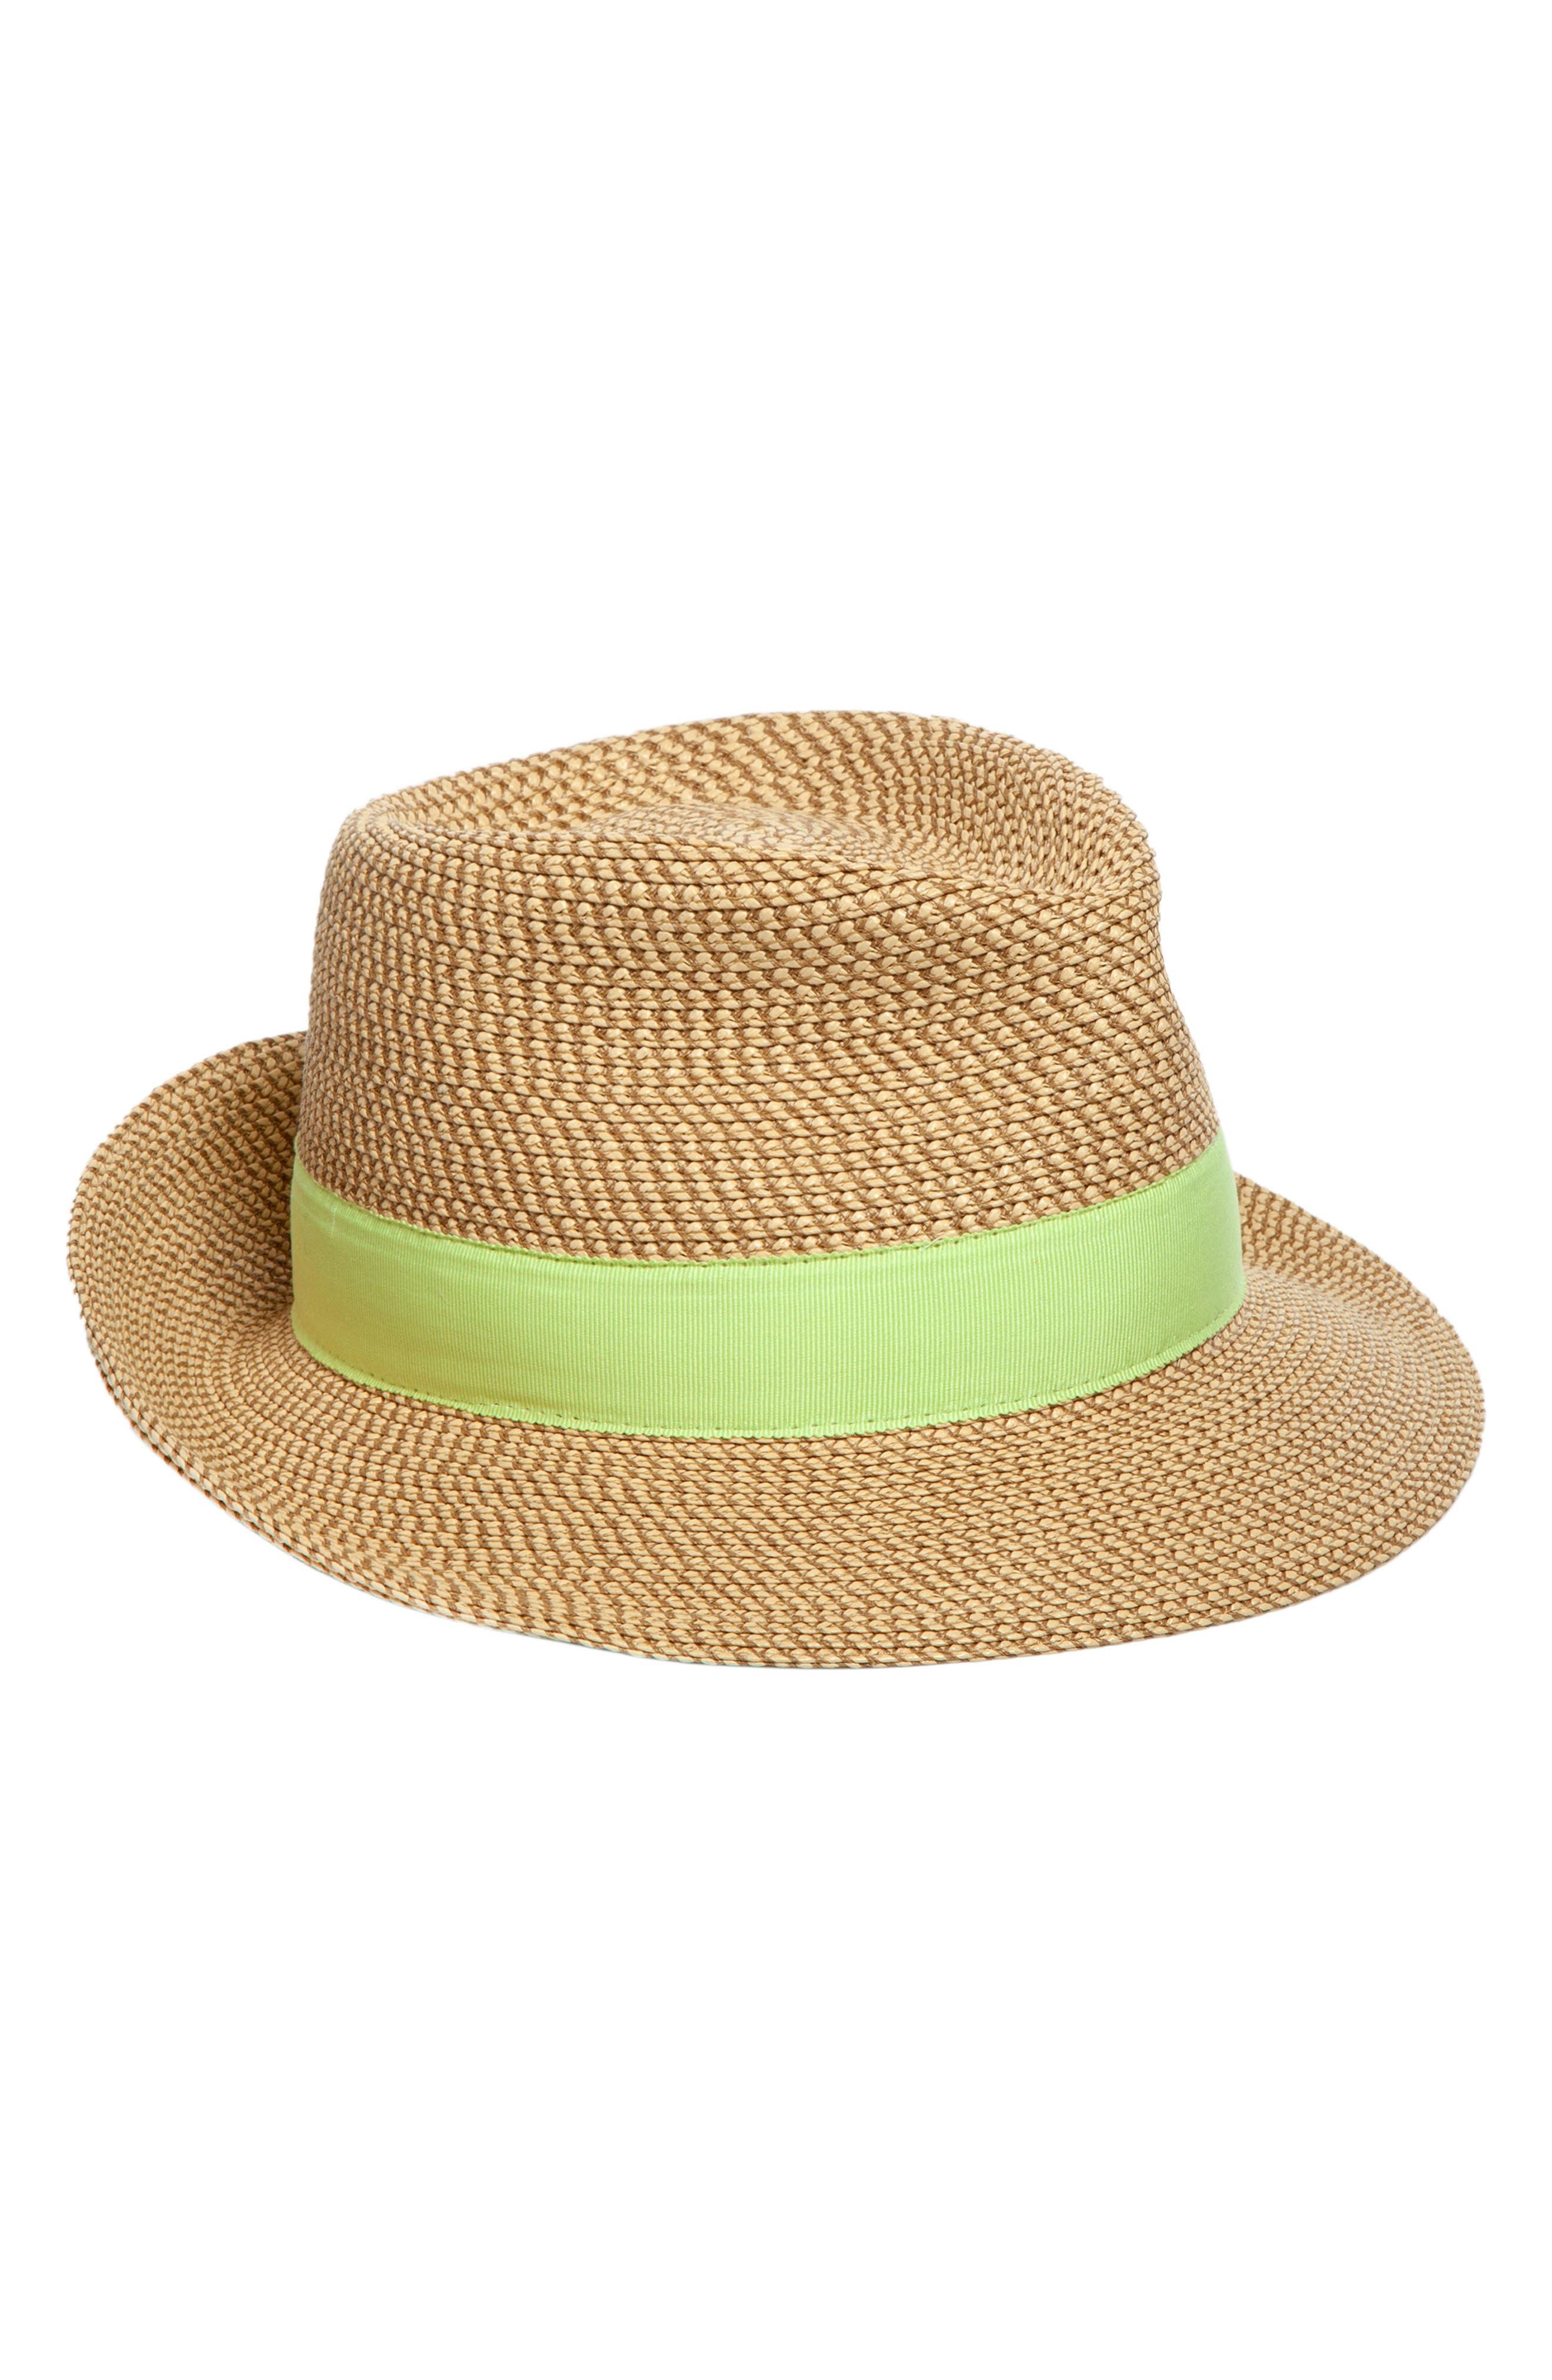 ERIC JAVITS Classic Squishee<sup>®</sup> Packable Fedora Sun Hat, Main, color, PEANUT/ CITRON